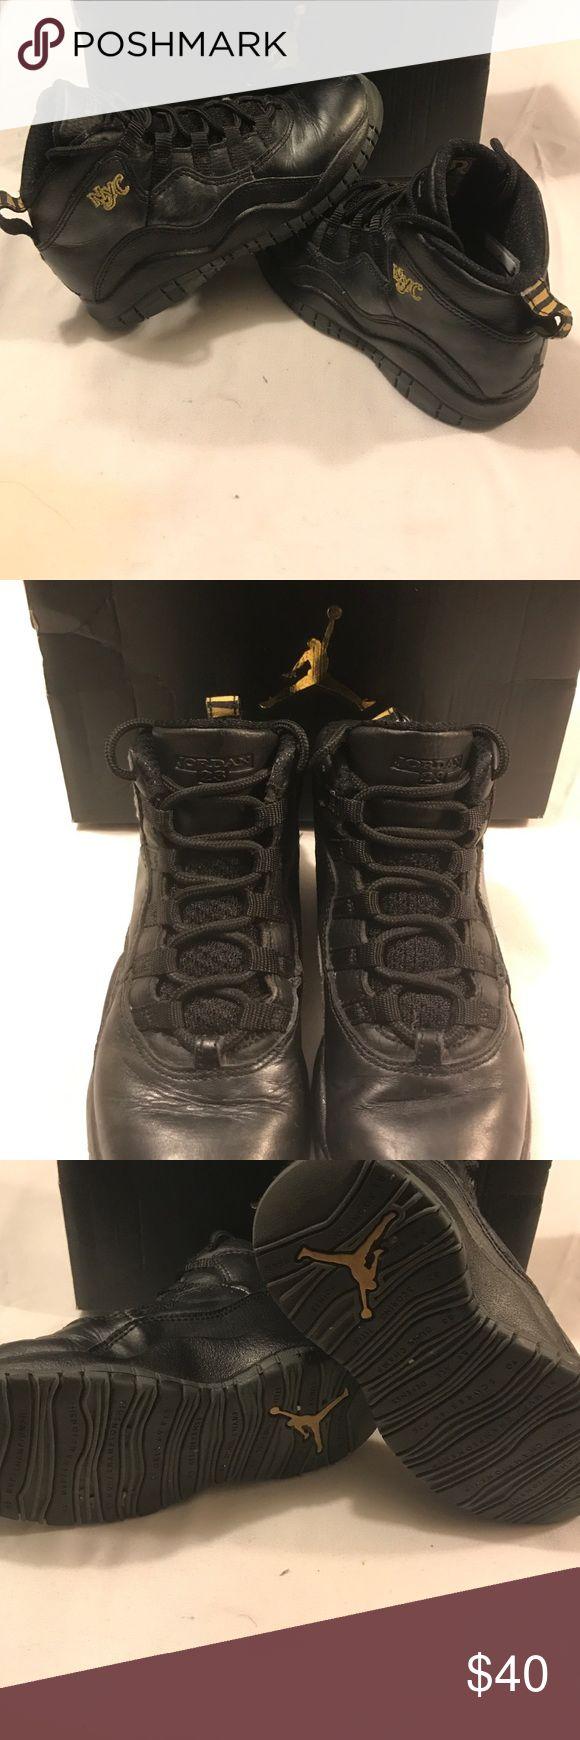 Jordan Retro 10 NYC Authentic black with gold detail Jordan retro 10 NYC's Jordan Shoes Sneakers